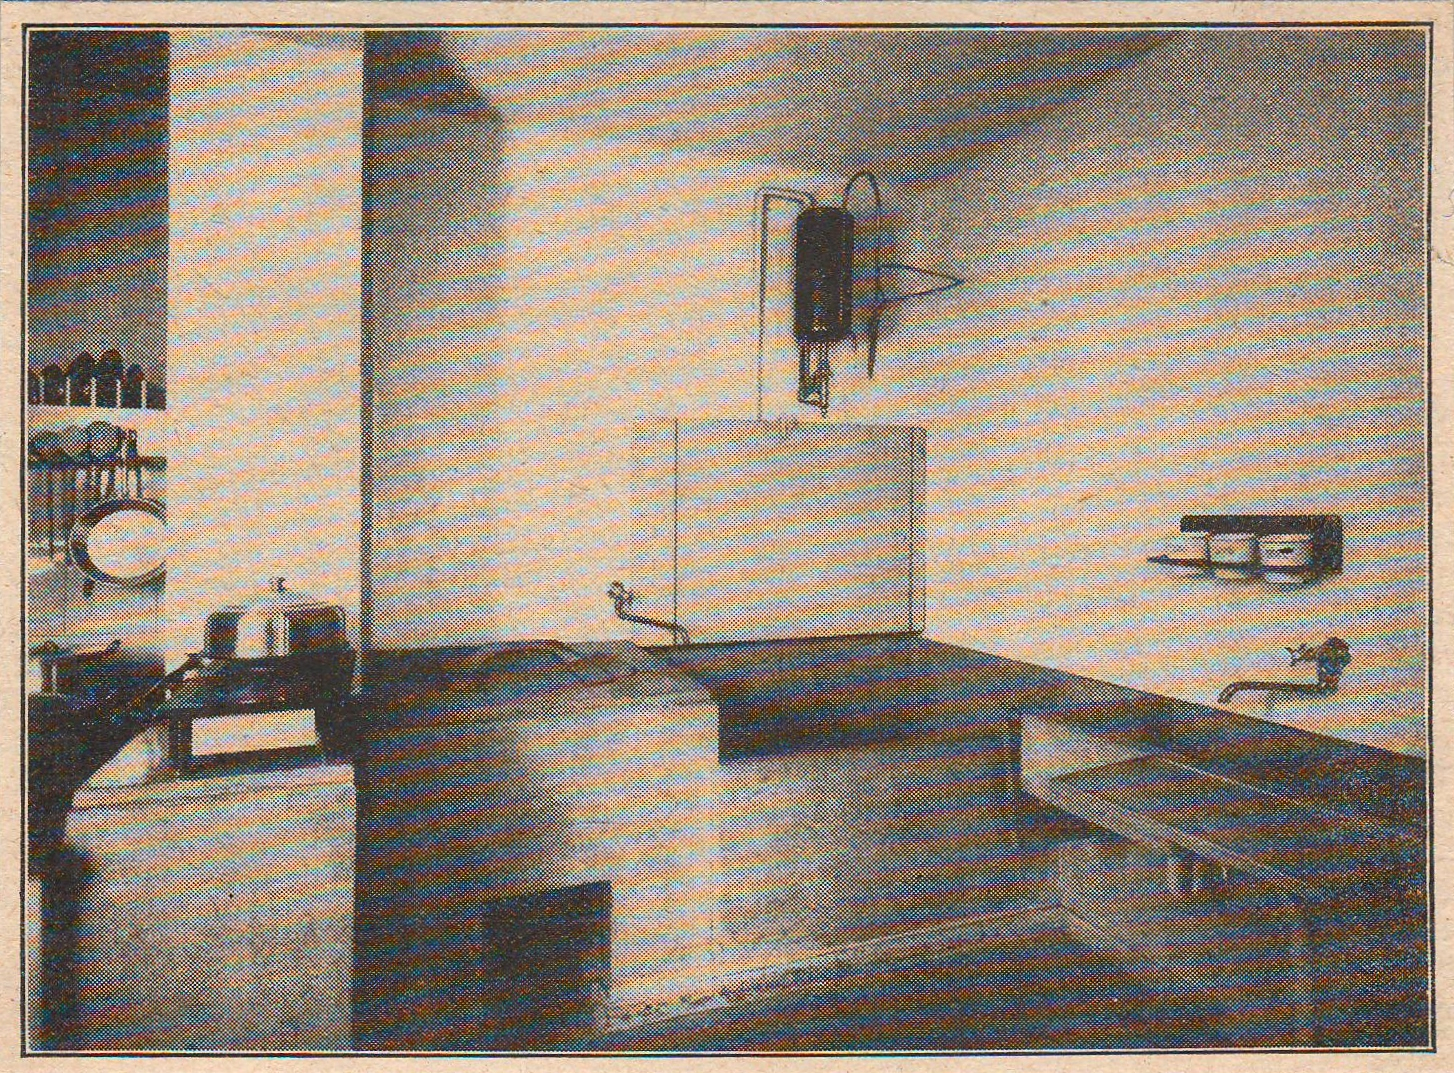 Küchenrückwand Bauhaus küchenrückwand glas obi rheumri com